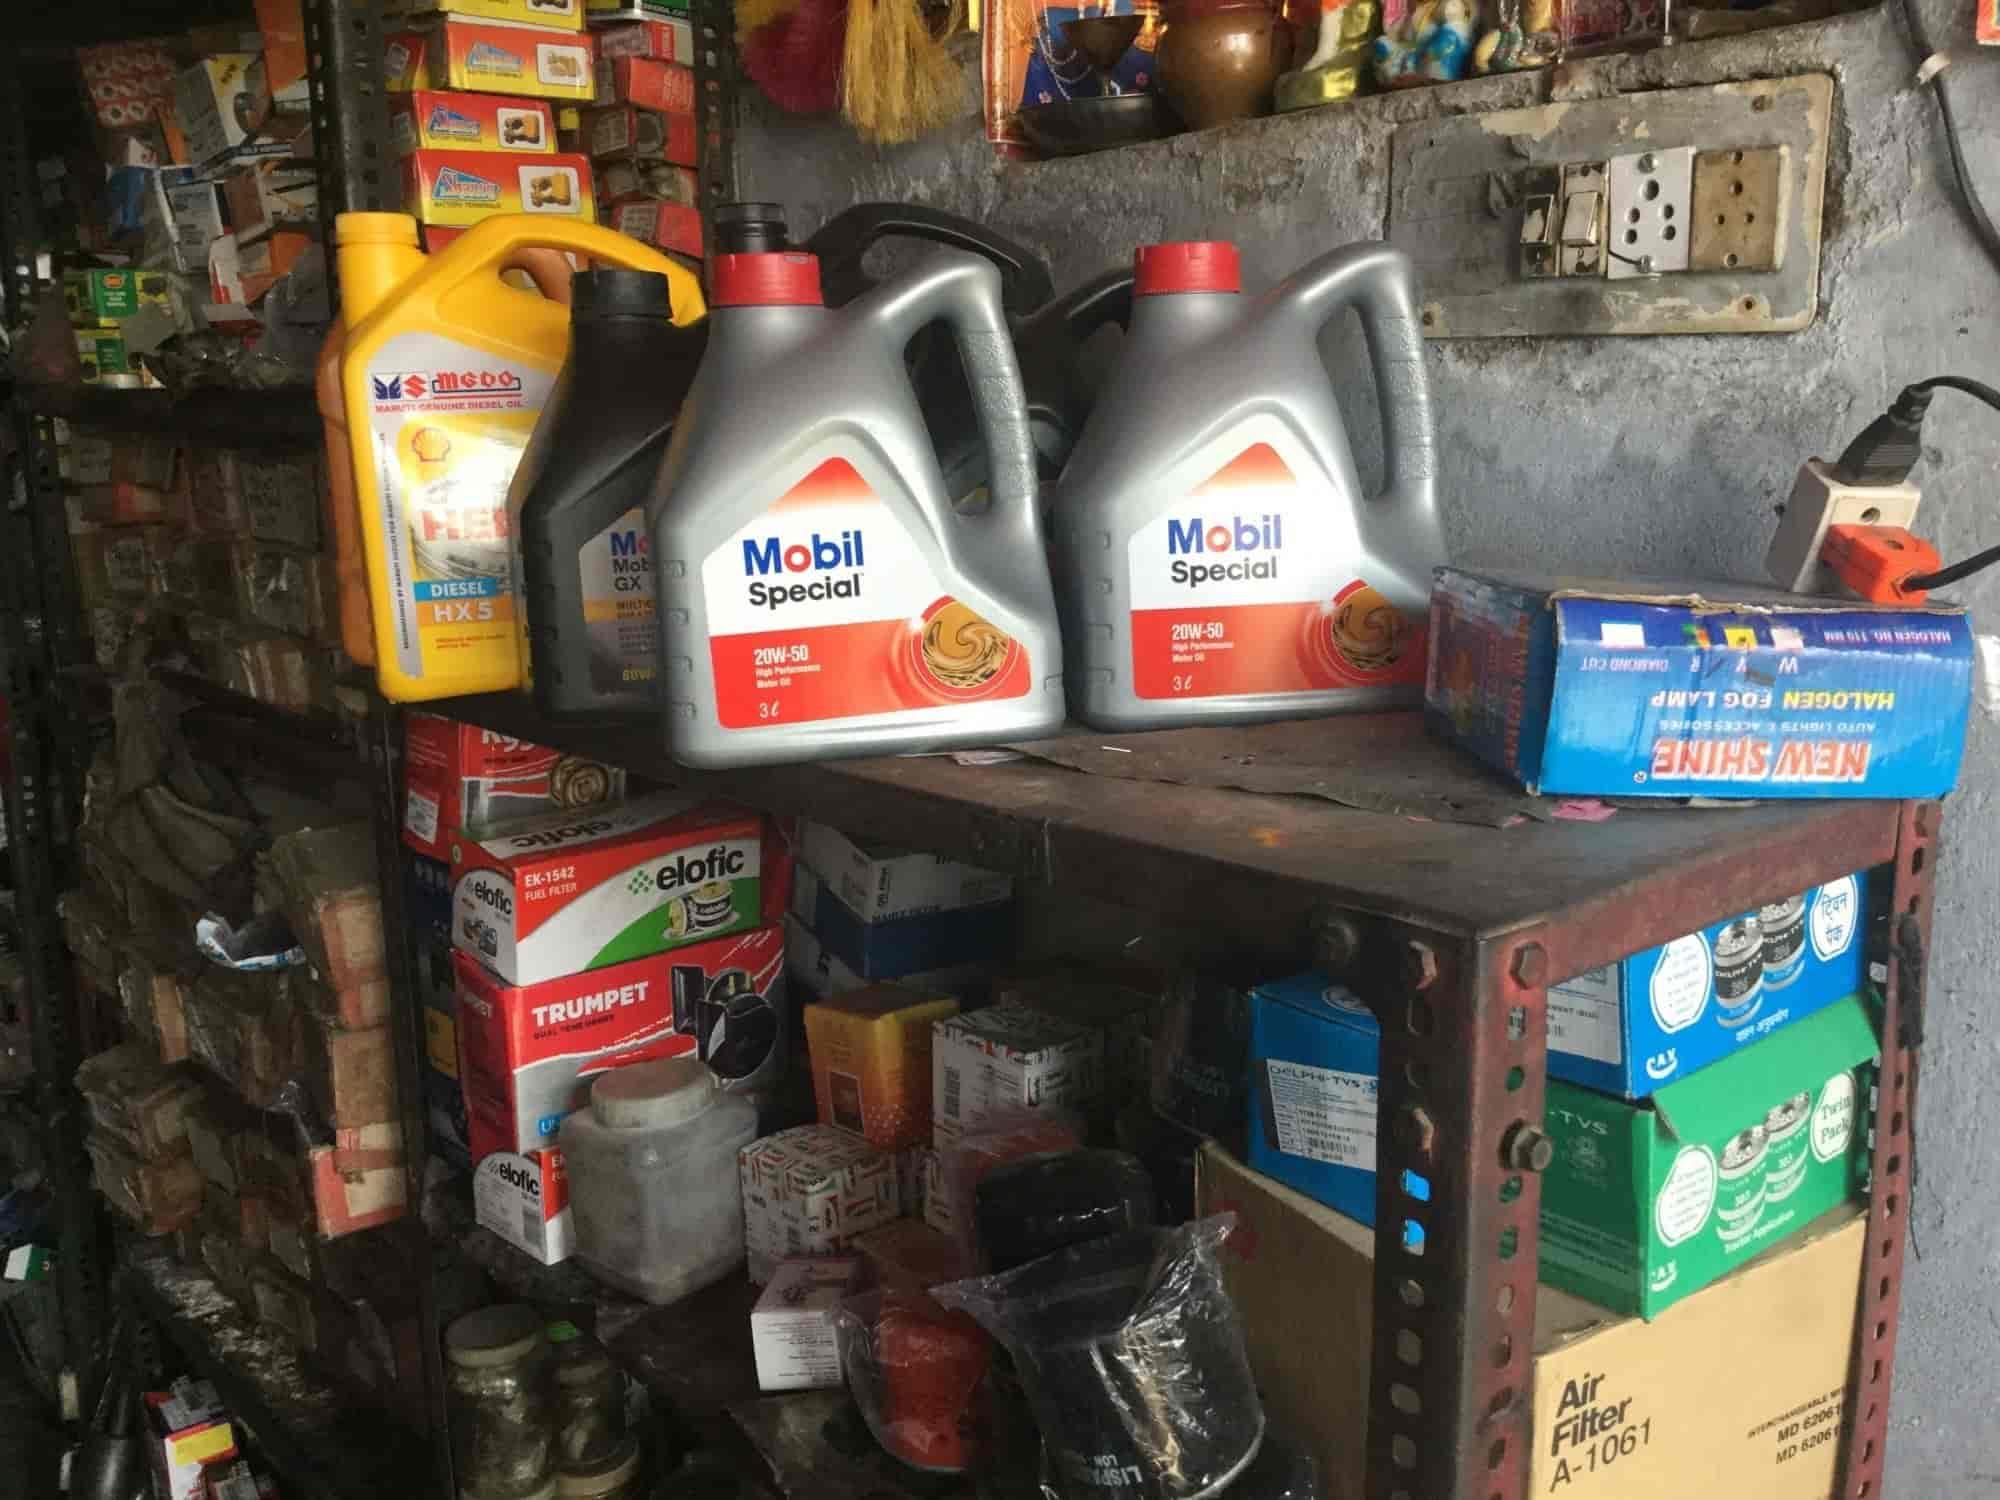 Modern Agencies Photos Jalandhar City Pictures Images High Performance Diesel Fuel Filters Car Repair Services